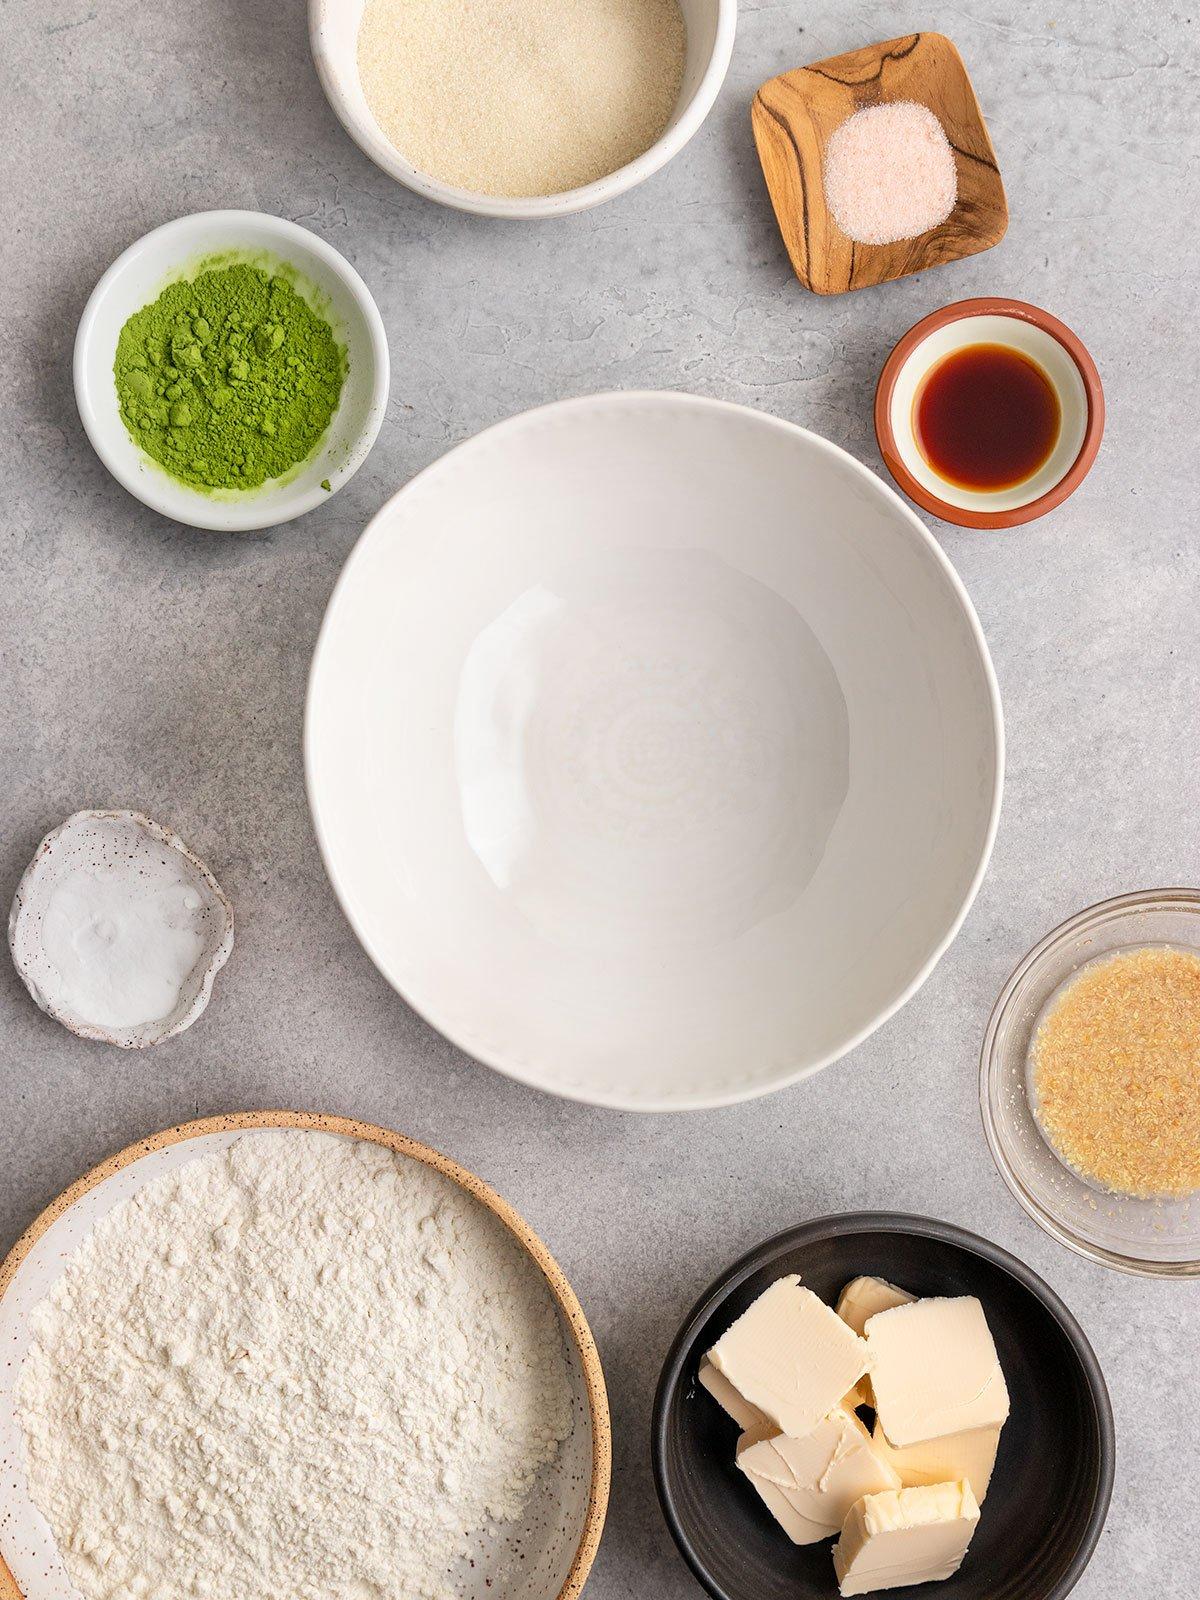 matcha cookie ingredients like flour, vegan butter, sugar, matcha, vanilla, baking powder, flax egg, salt